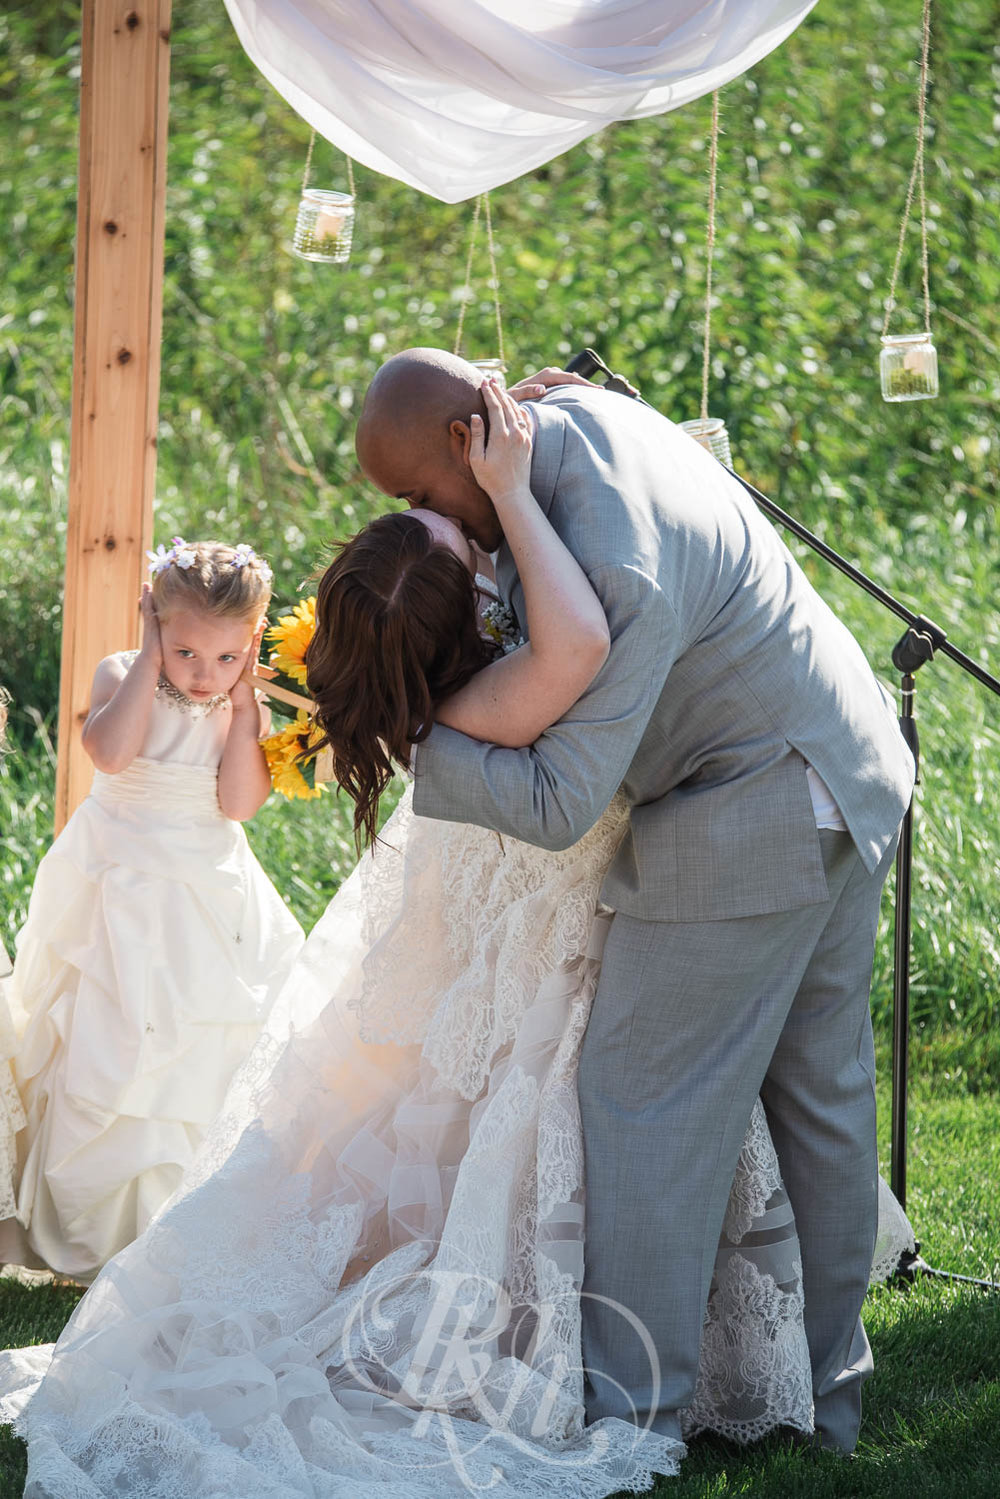 Christy & Matt - Wisconsin Wedding Photography - Birch Hill Barn - RKH Images  (30 of 47).jpg